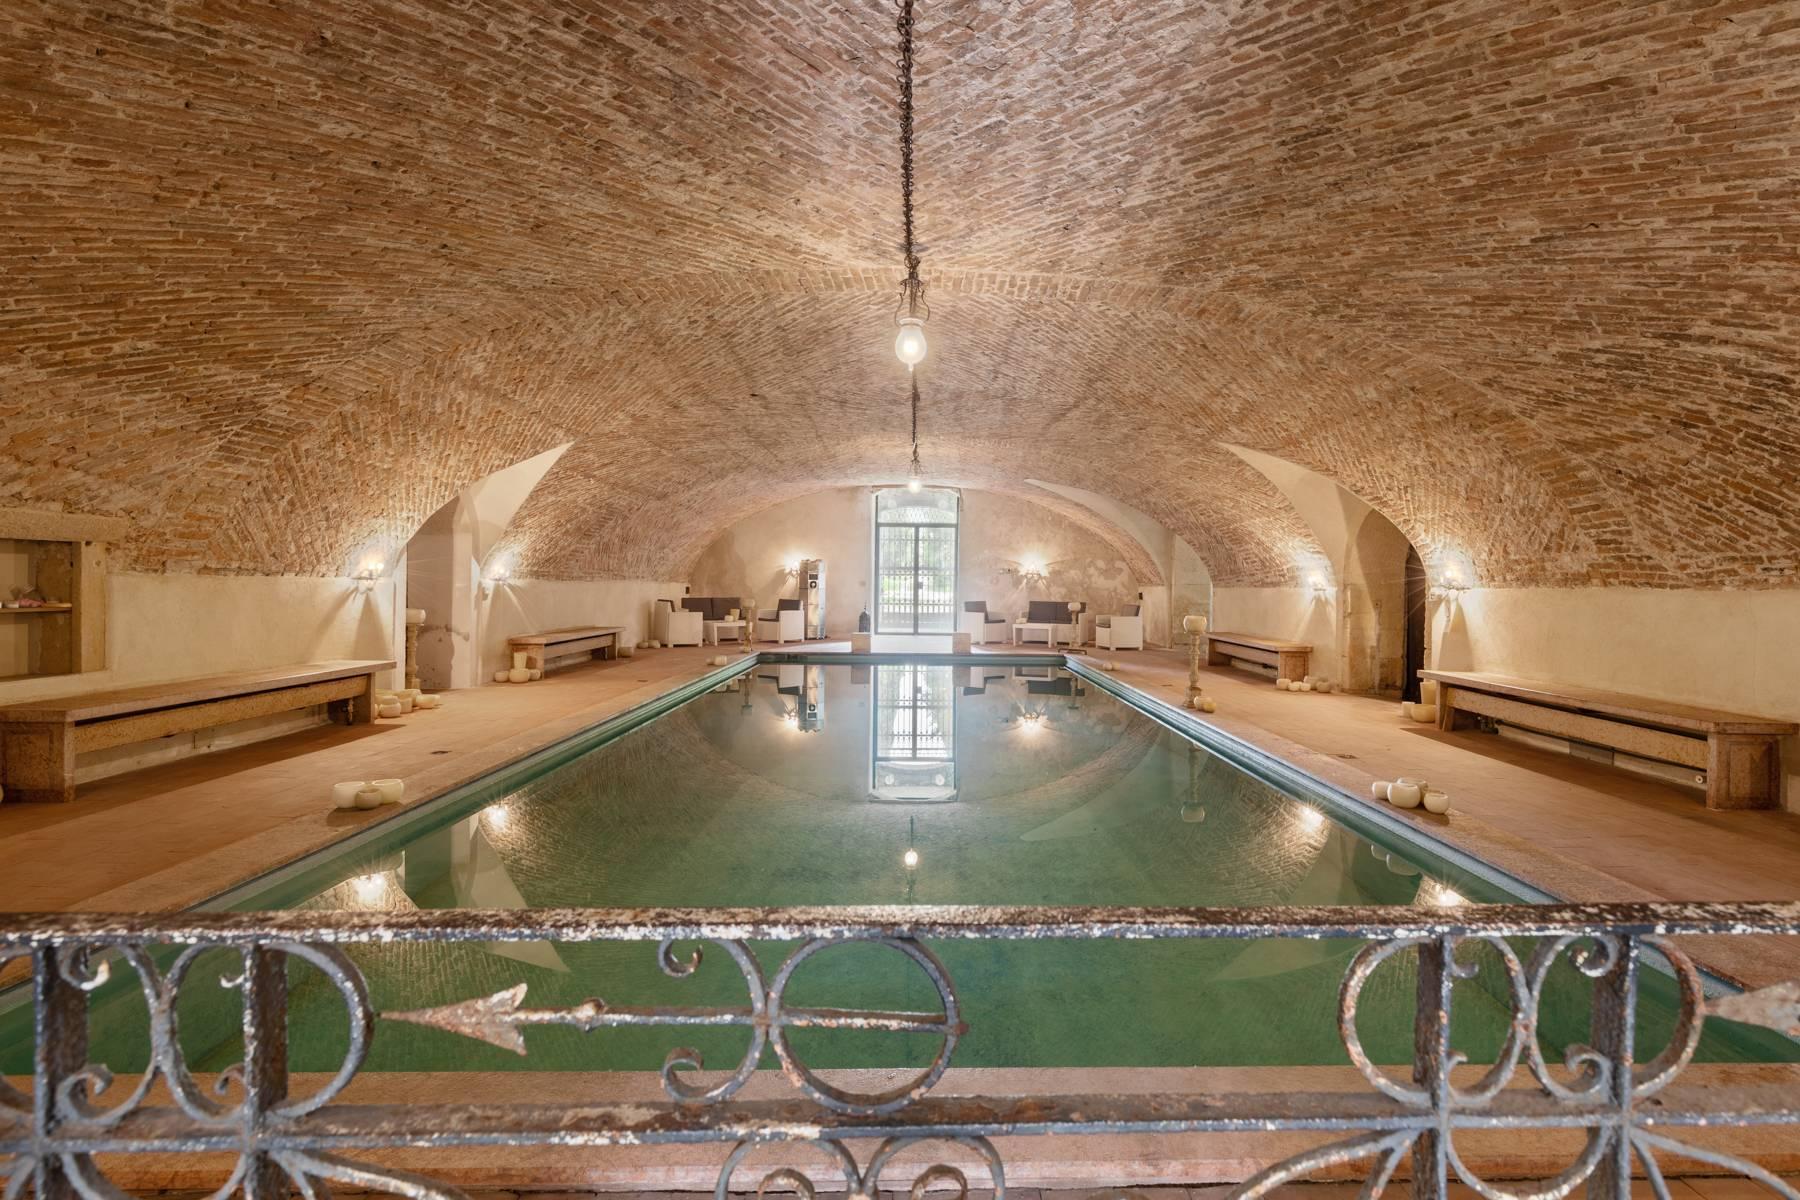 Villa in Vendita a Verona: 5 locali, 2400 mq - Foto 16